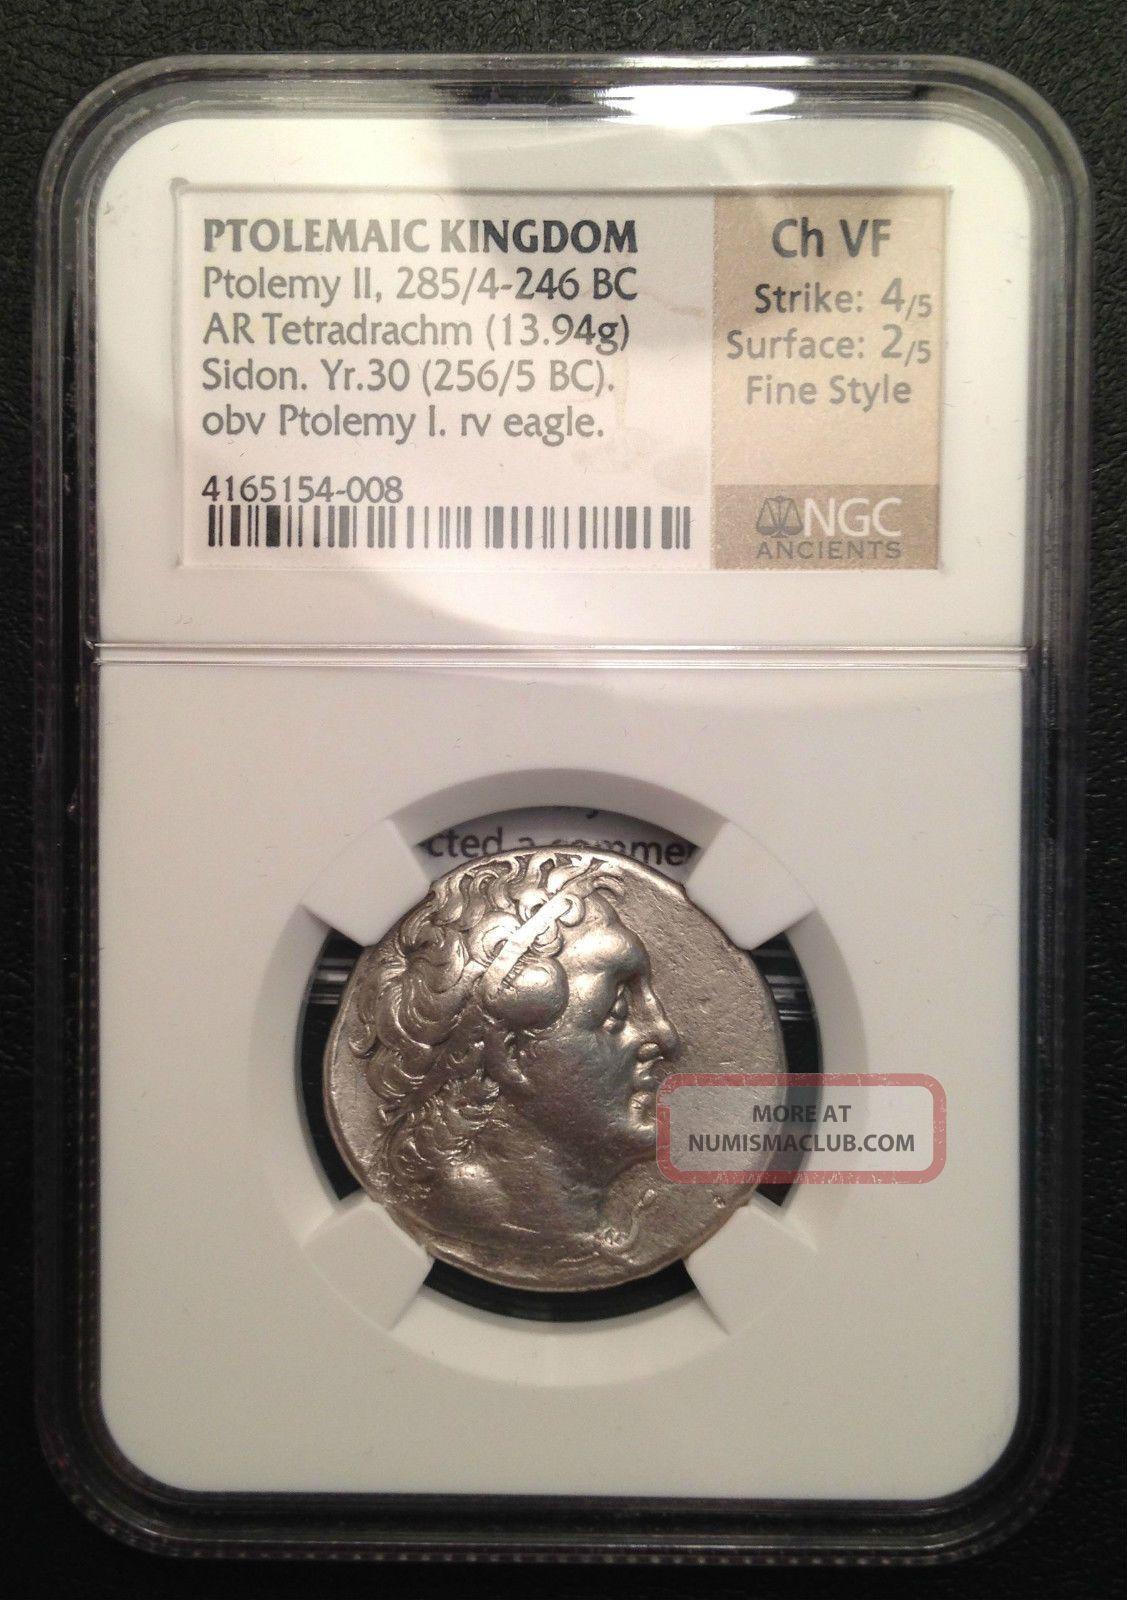 Greece,  Ptolemy Ii,  Tetradrachm,  285bc,  Ngc Choice Vf Coins: Ancient photo